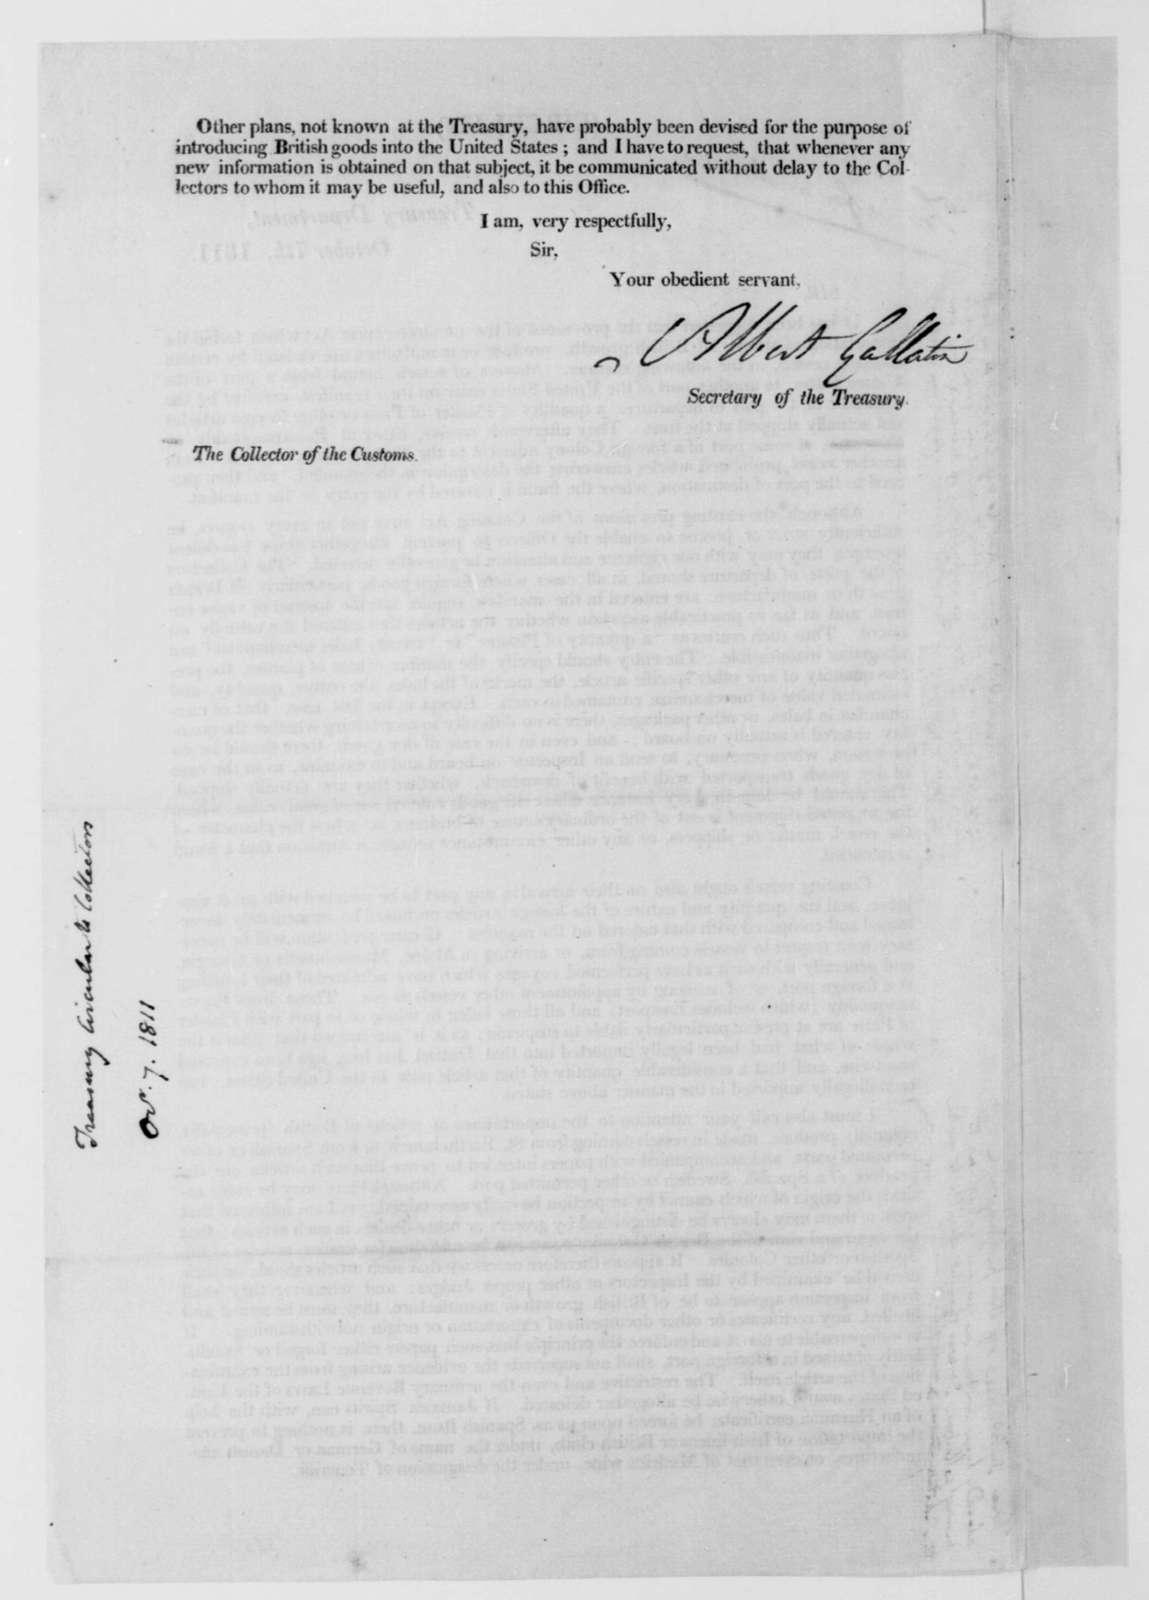 Albert Gallatin to Collector of the Customs, October 7, 1811. Printed circular and notes.